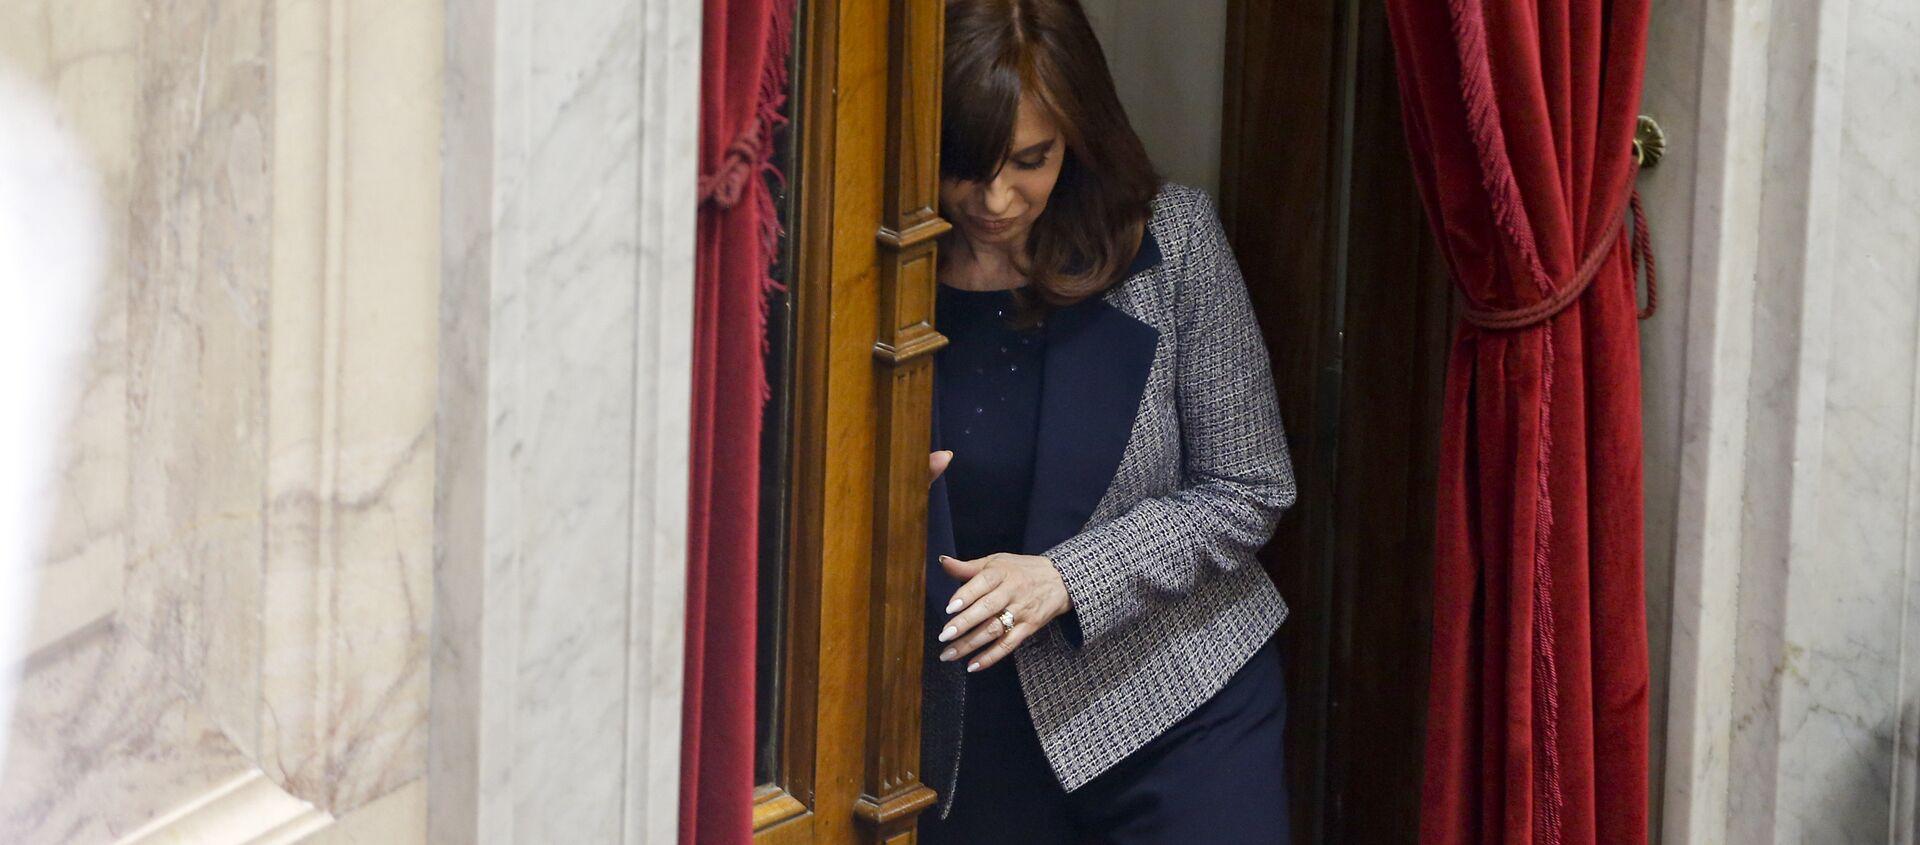 Cristina Fernández de Kirchner, expresidenta de Argentina (archivo) - Sputnik Mundo, 1920, 03.02.2020